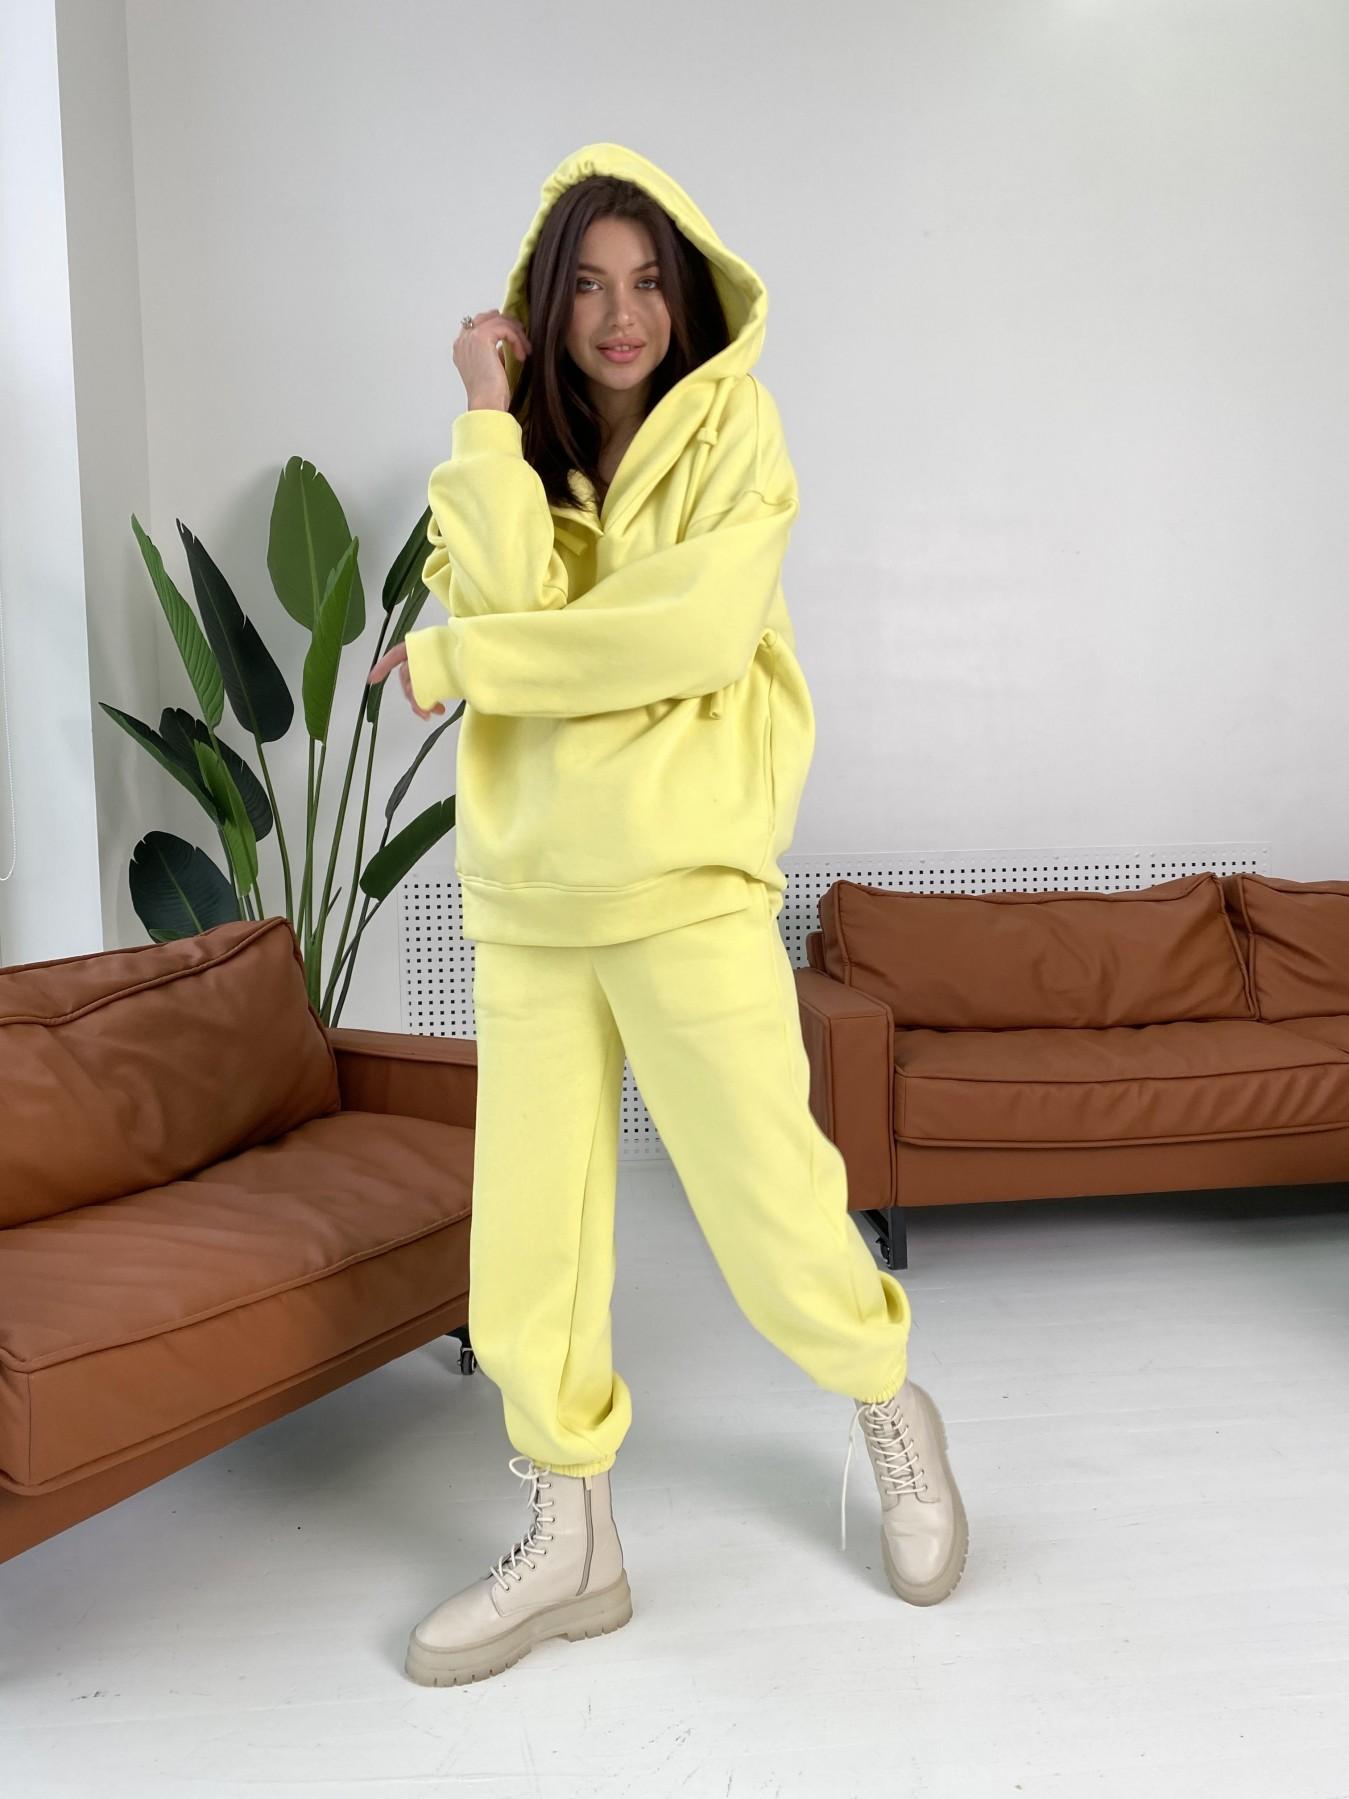 Ярис костюм из 3х нитки 10789 АРТ. 47259 Цвет: Лимон - фото 7, интернет магазин tm-modus.ru